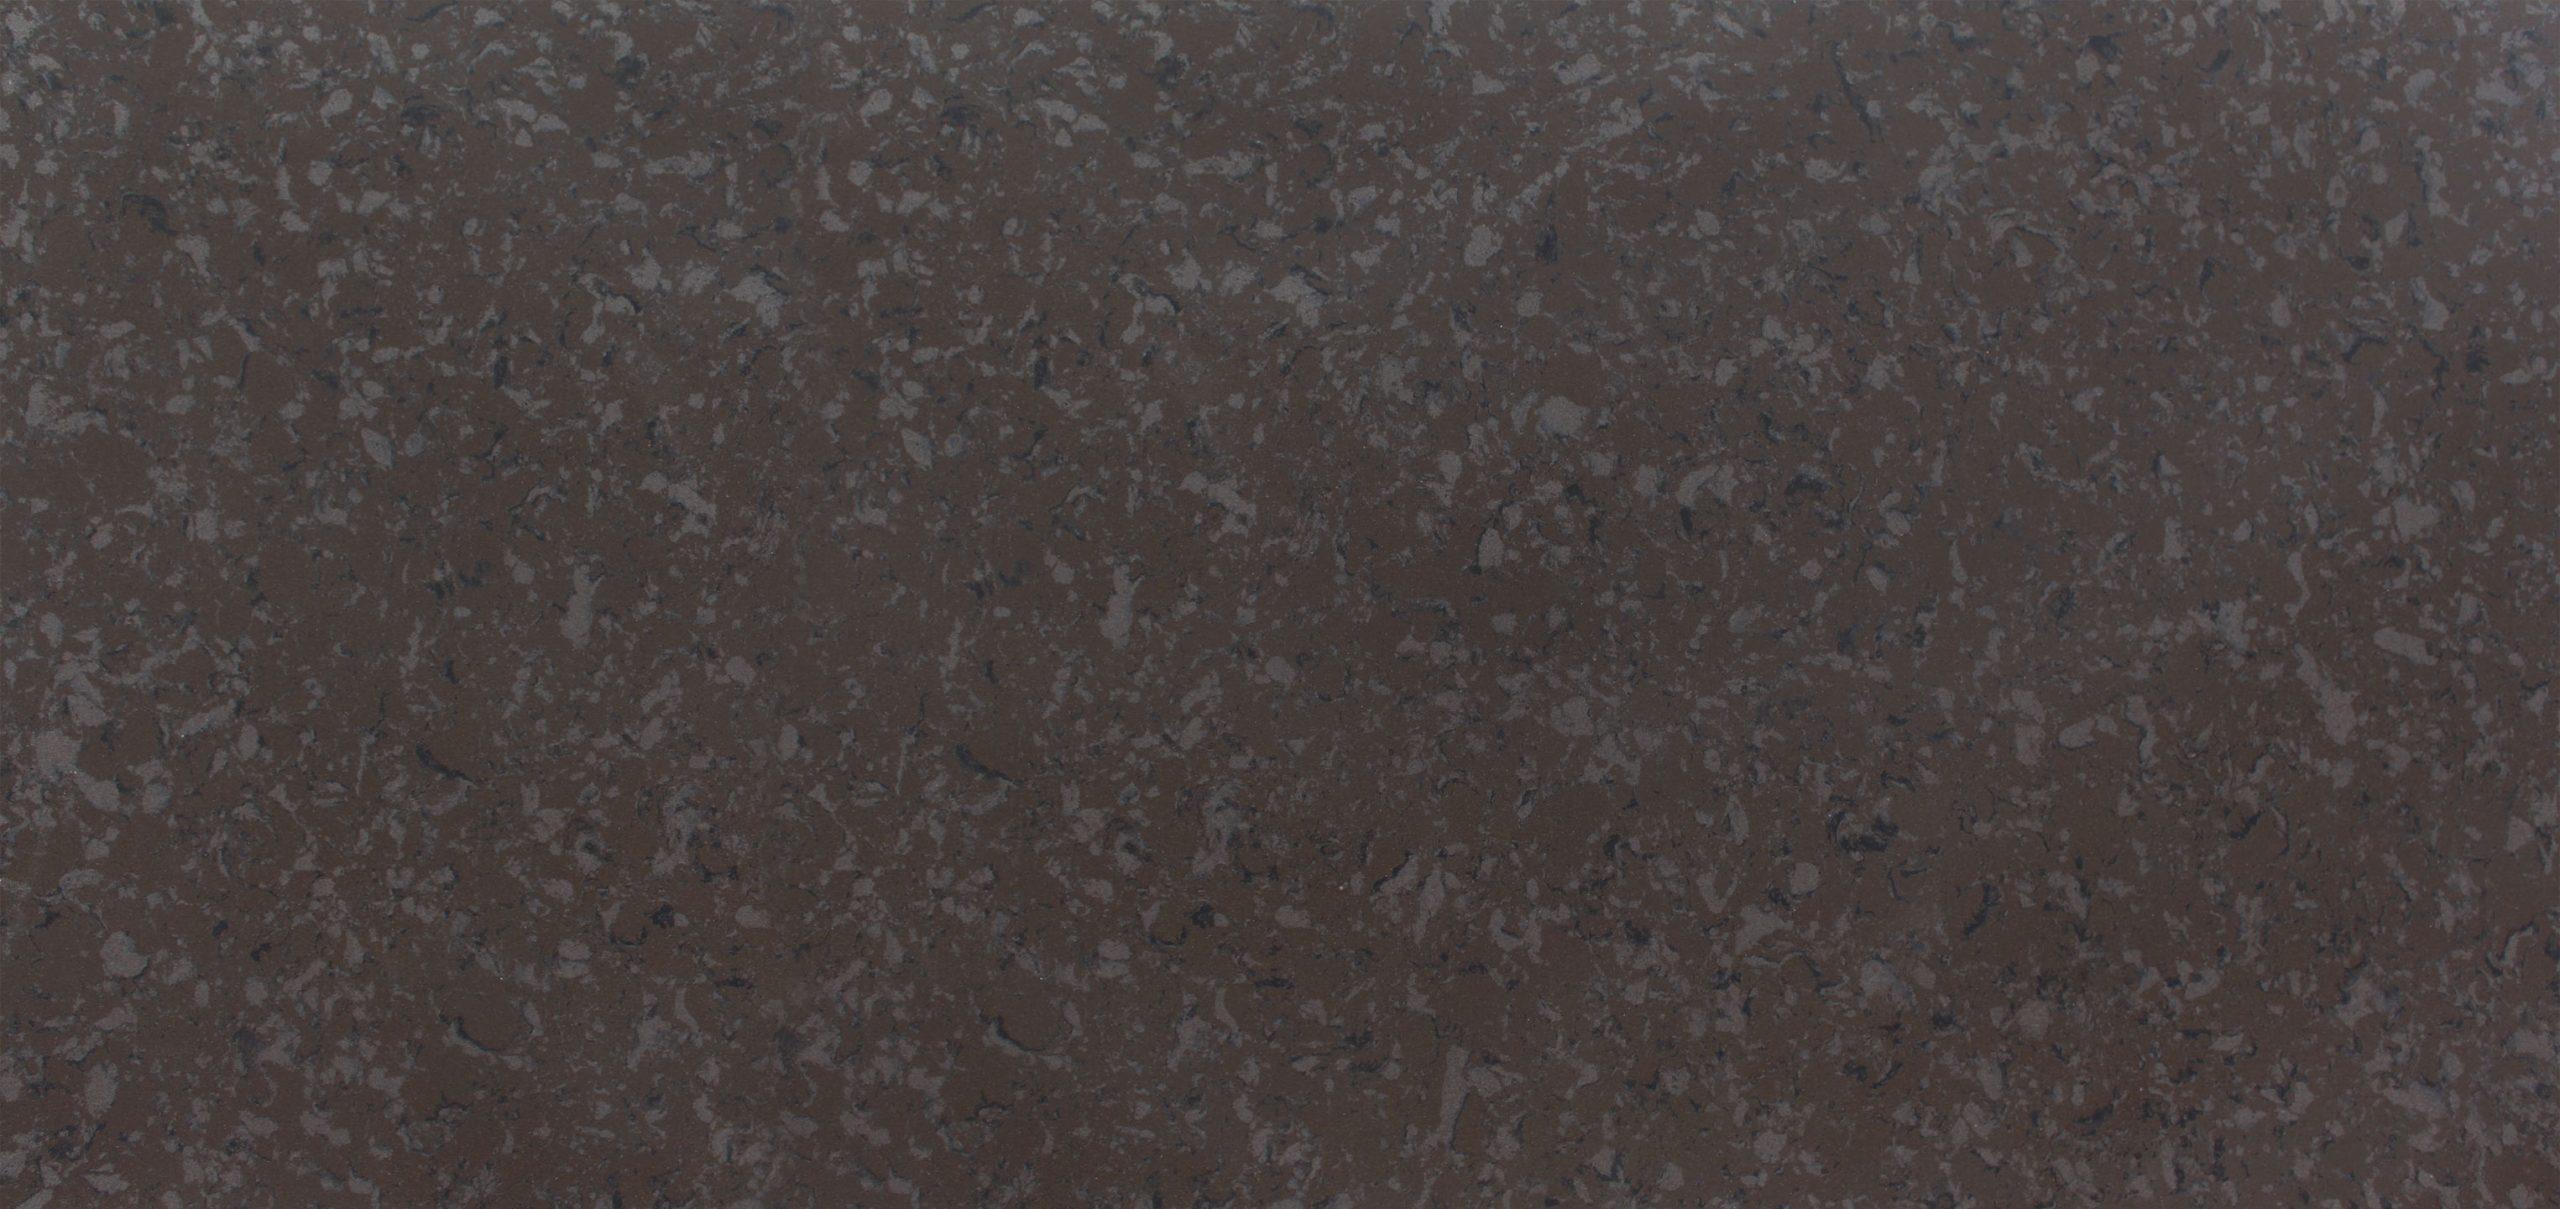 Vicostone Titanium Brown BQ9360 02